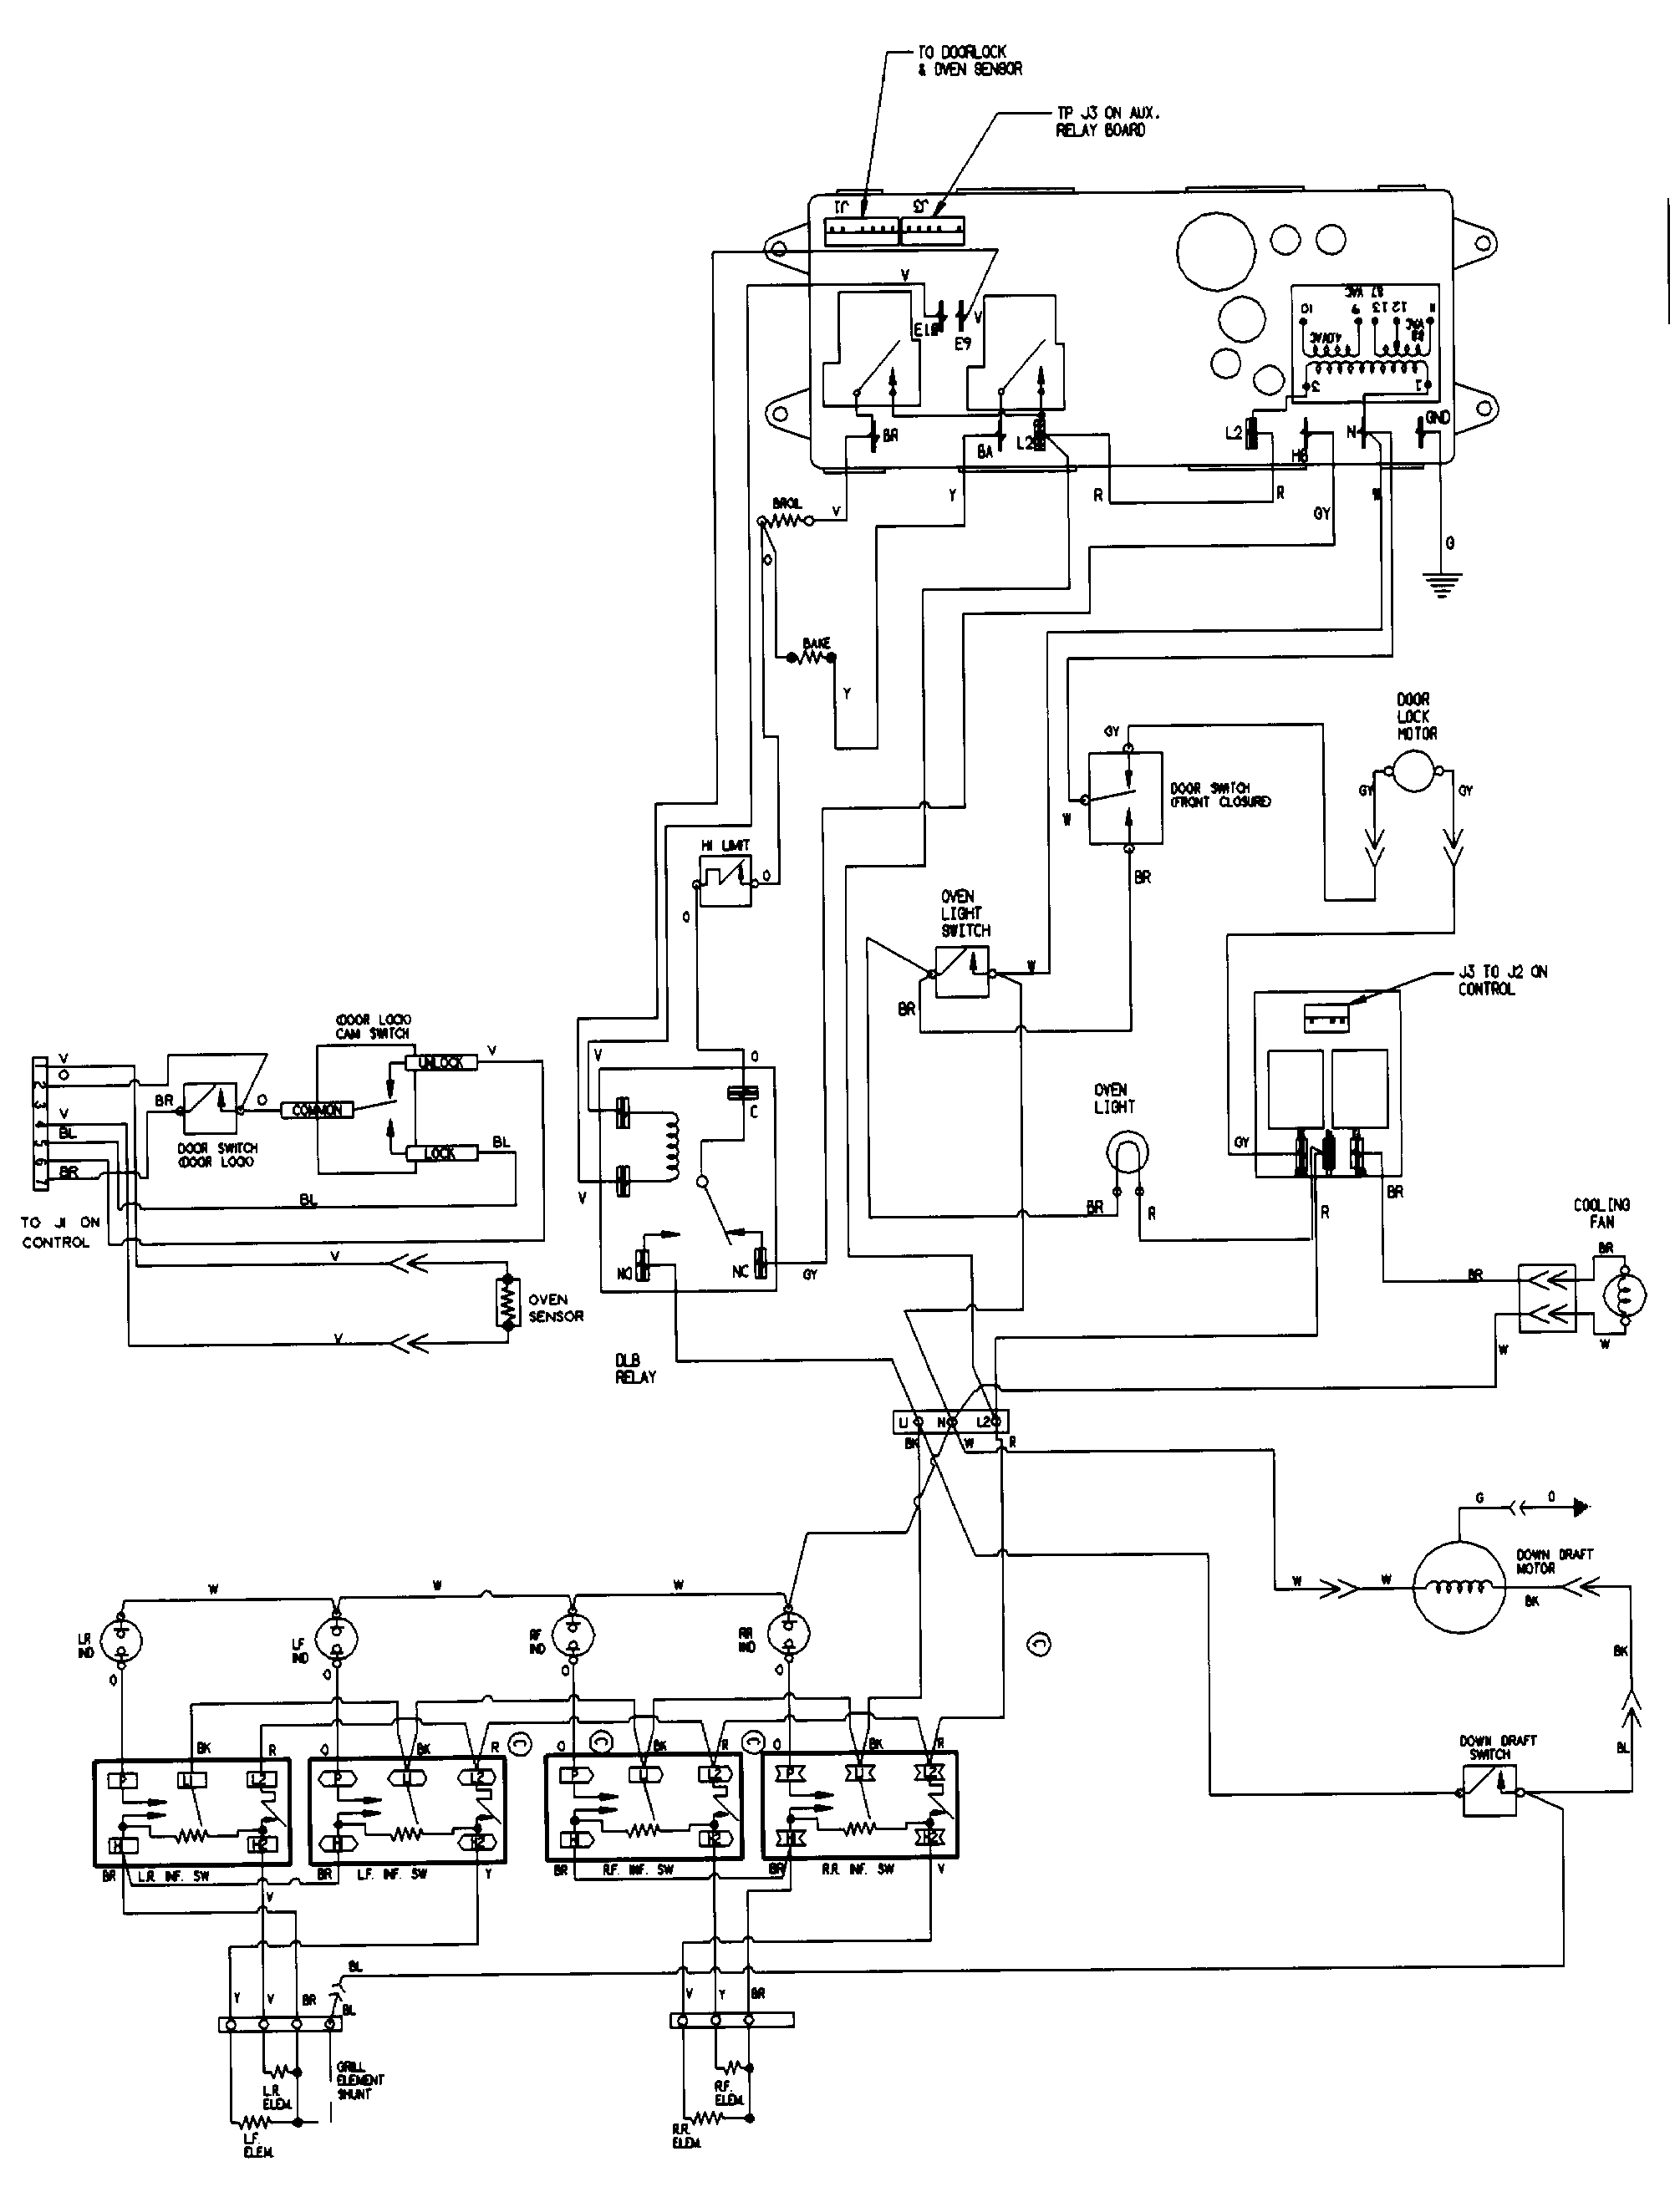 Dcs Oven Wiring Diagram - Kenwood Equalizer Wiring Diagram -  clubcars.sususehat.decorresine.itWiring Diagram Resource